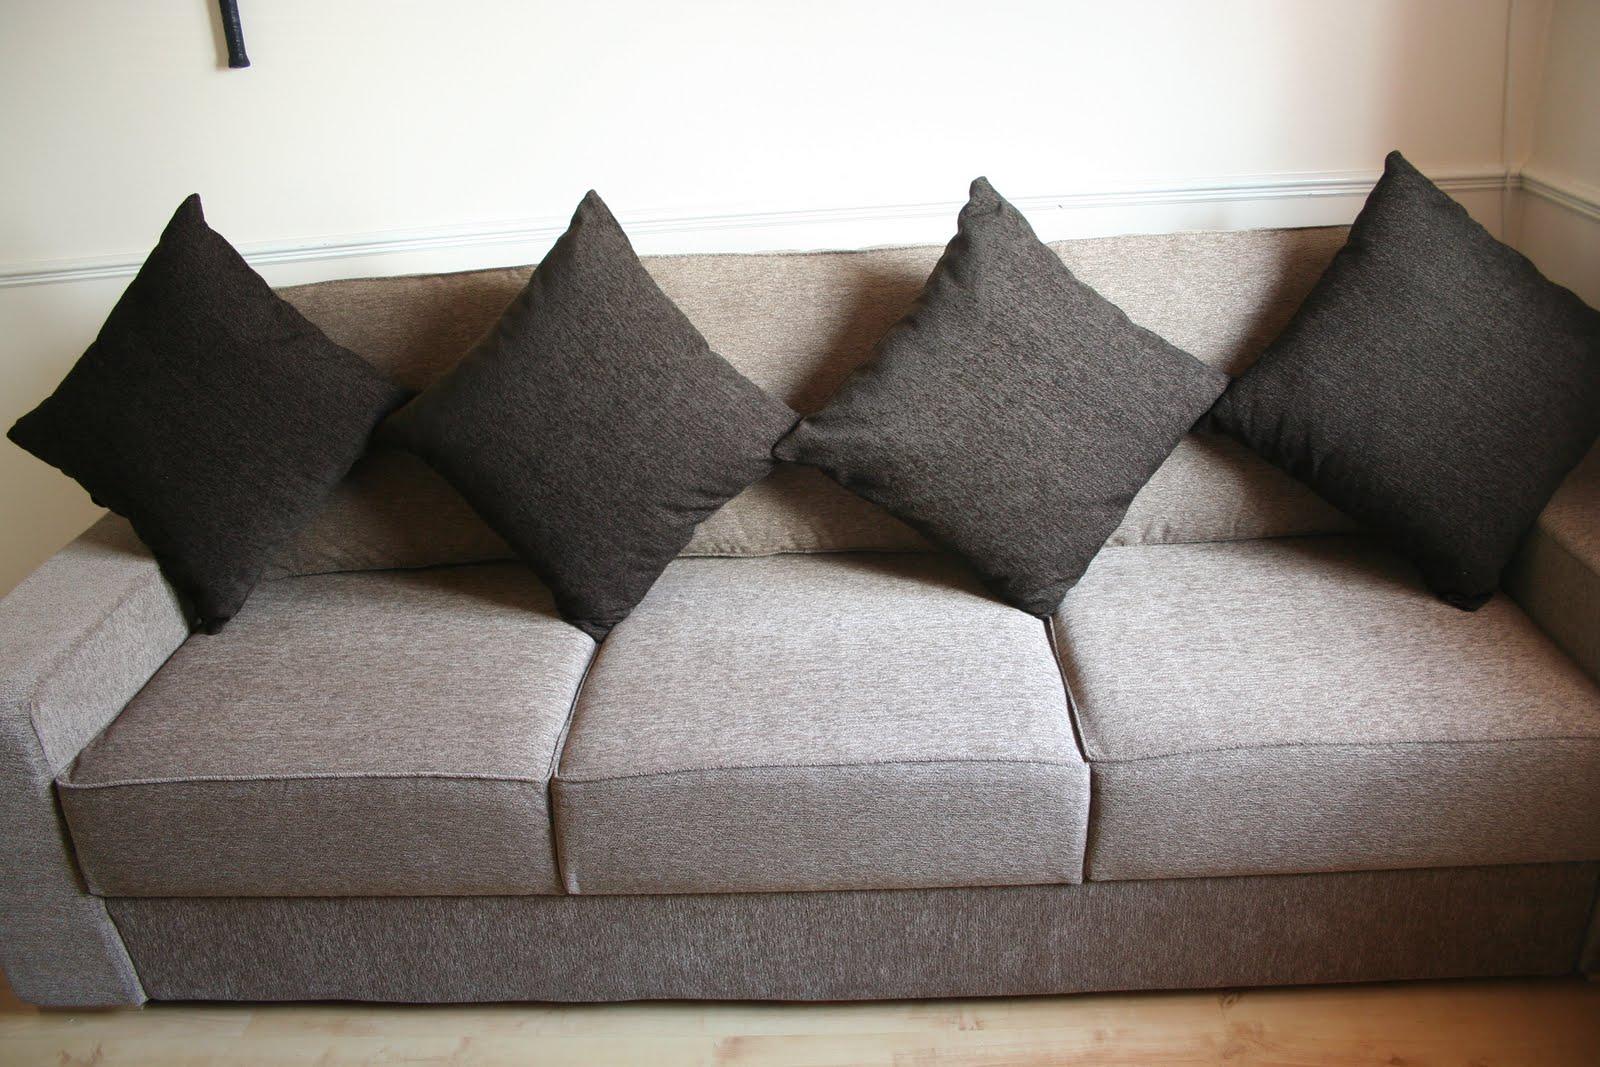 Sofa Cushion Support Reviews Tropical Print Slipcovers Modular Nabru Review